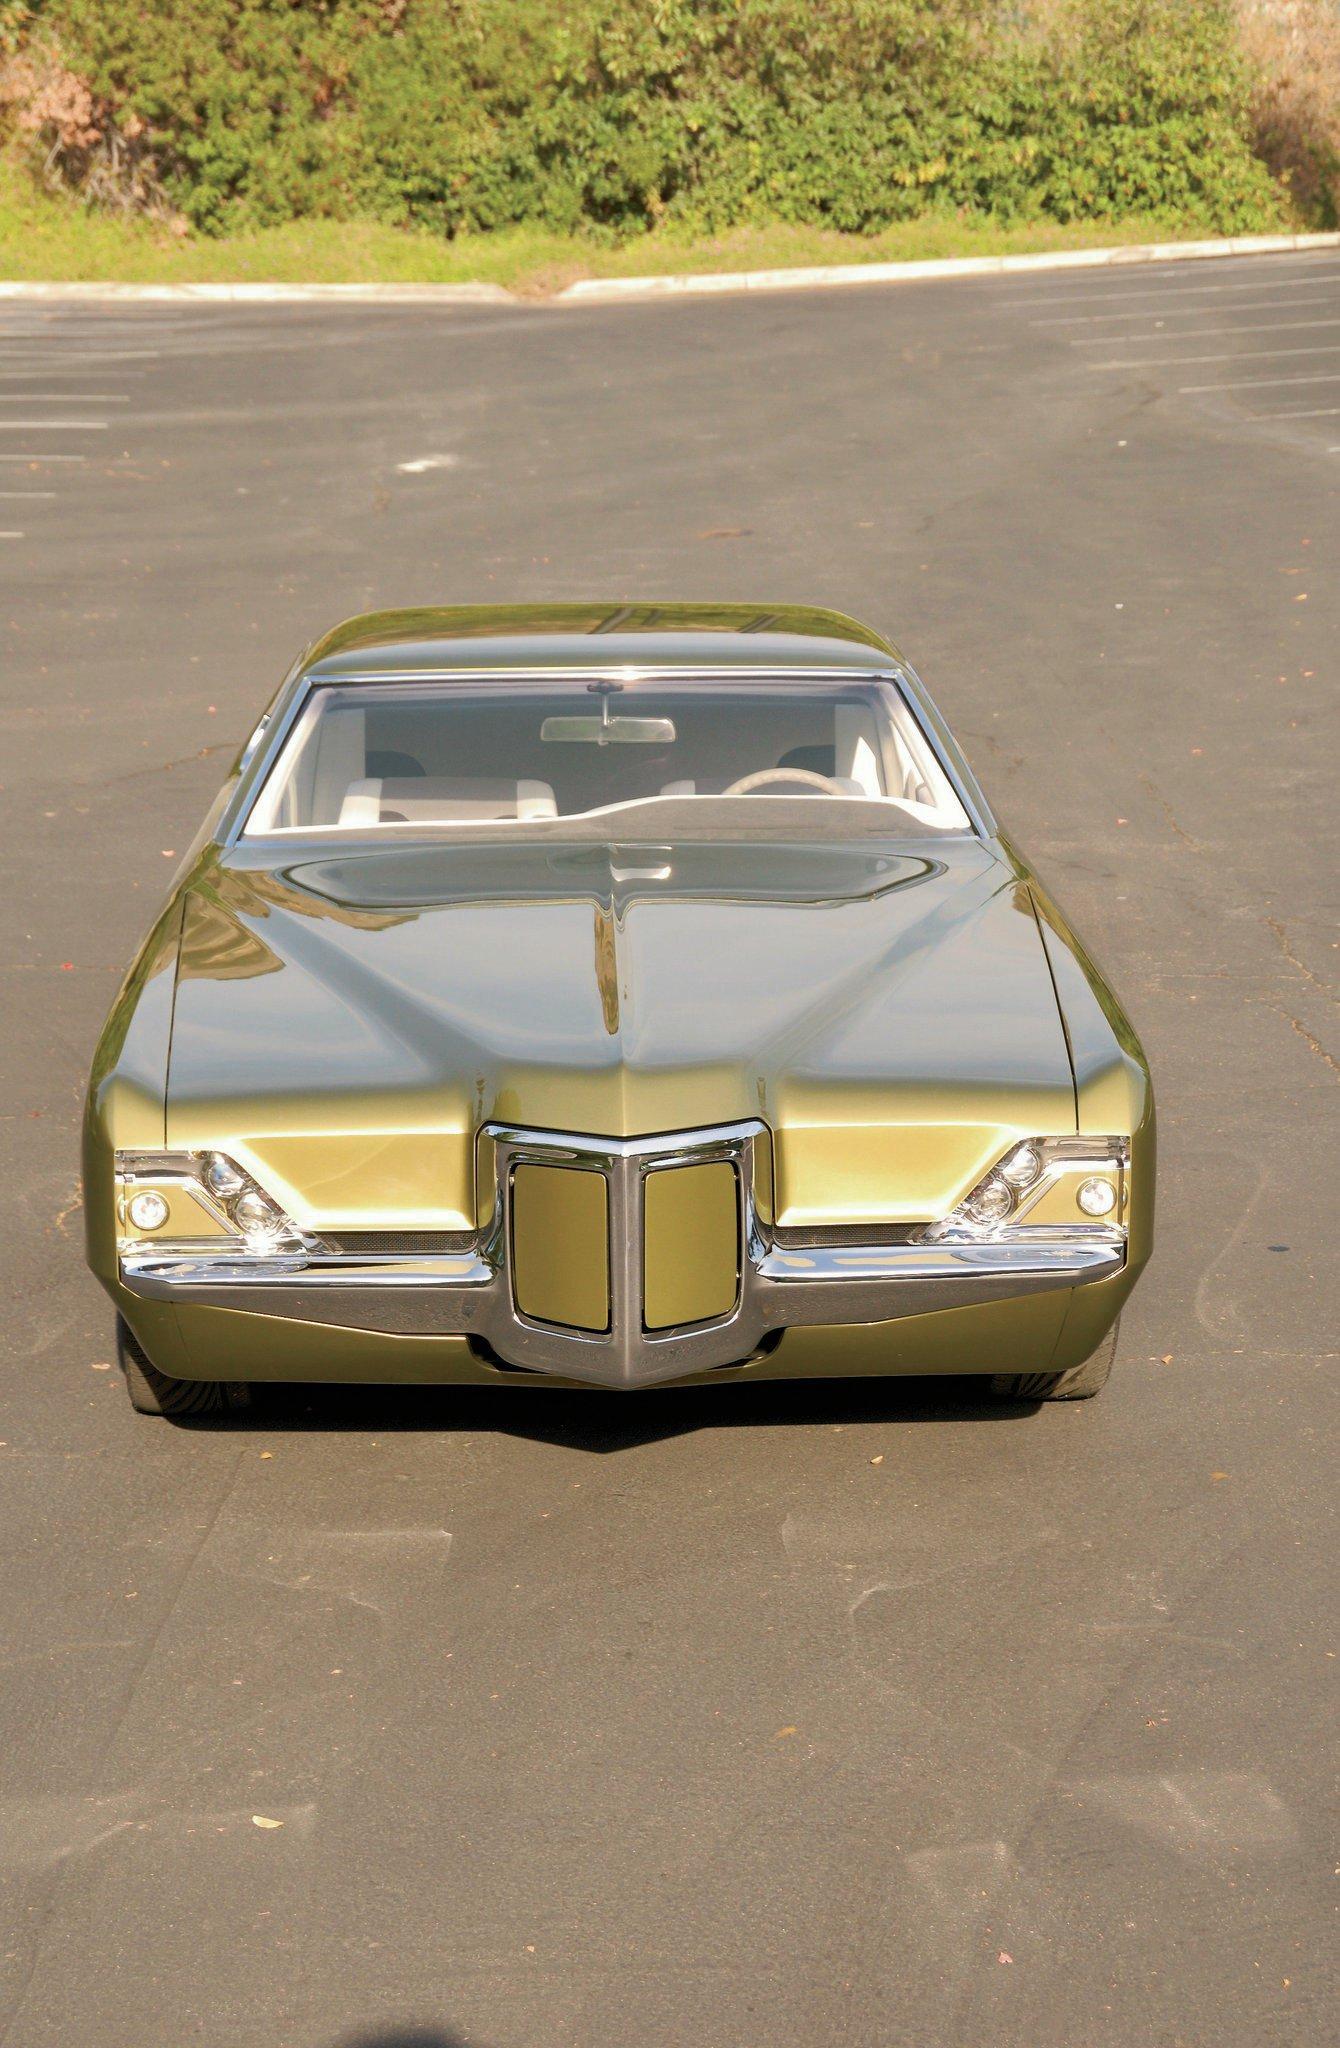 Camaro Car 1969 Project